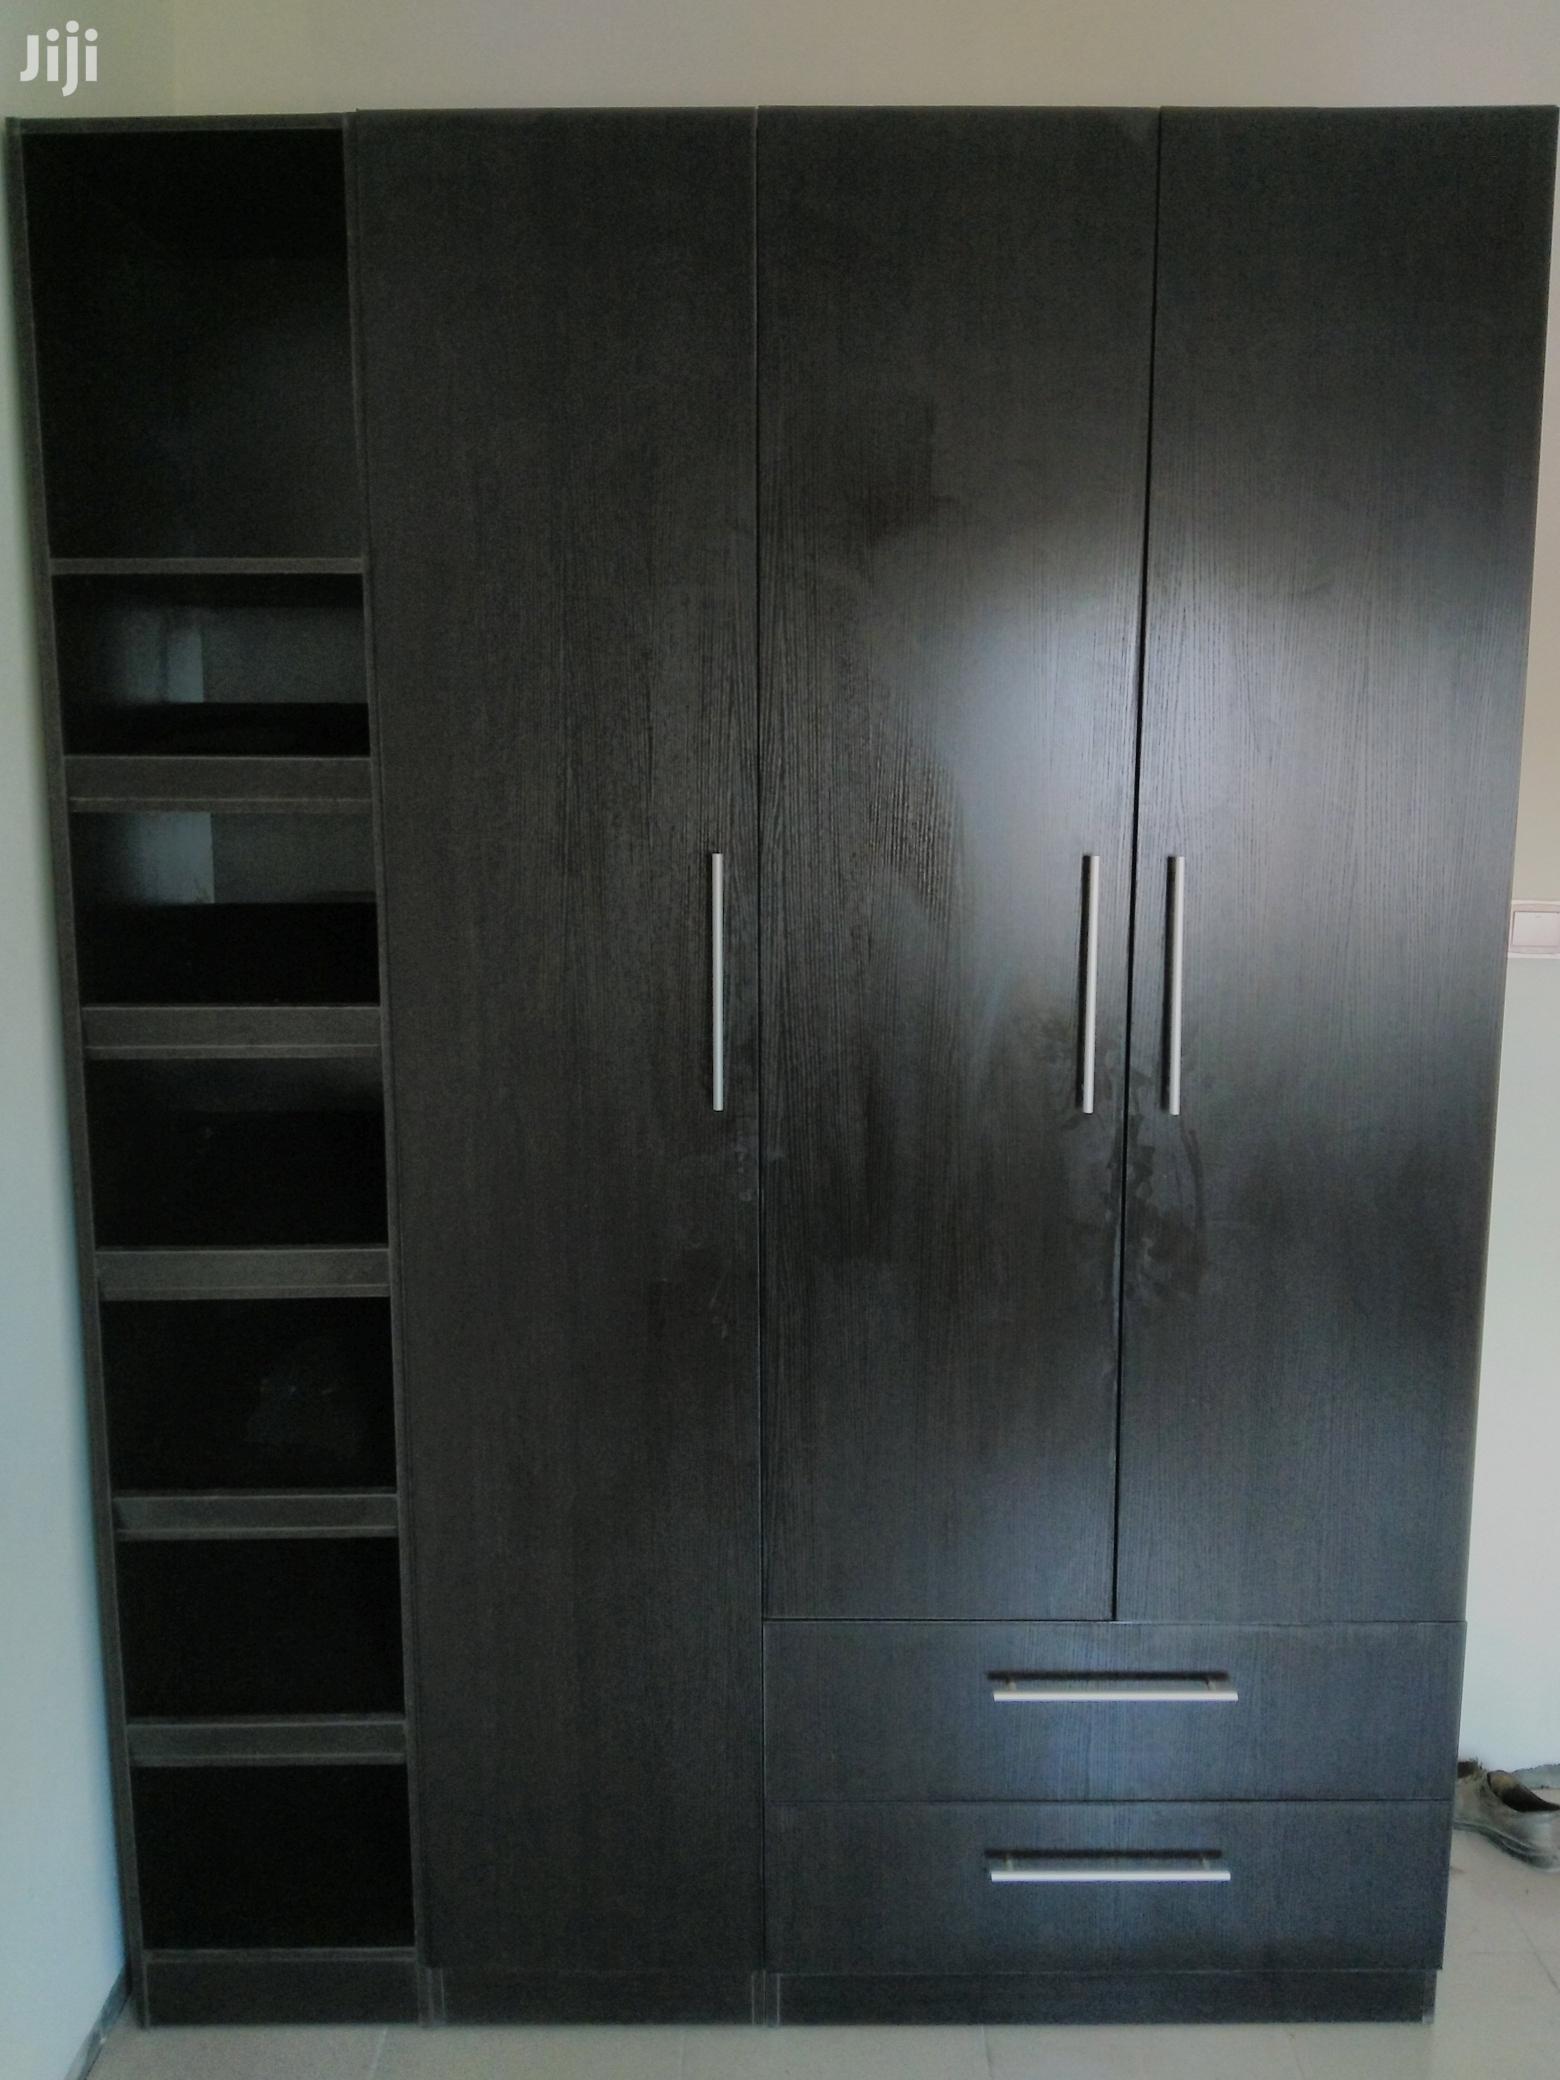 6ft X 5ft Wardrobe